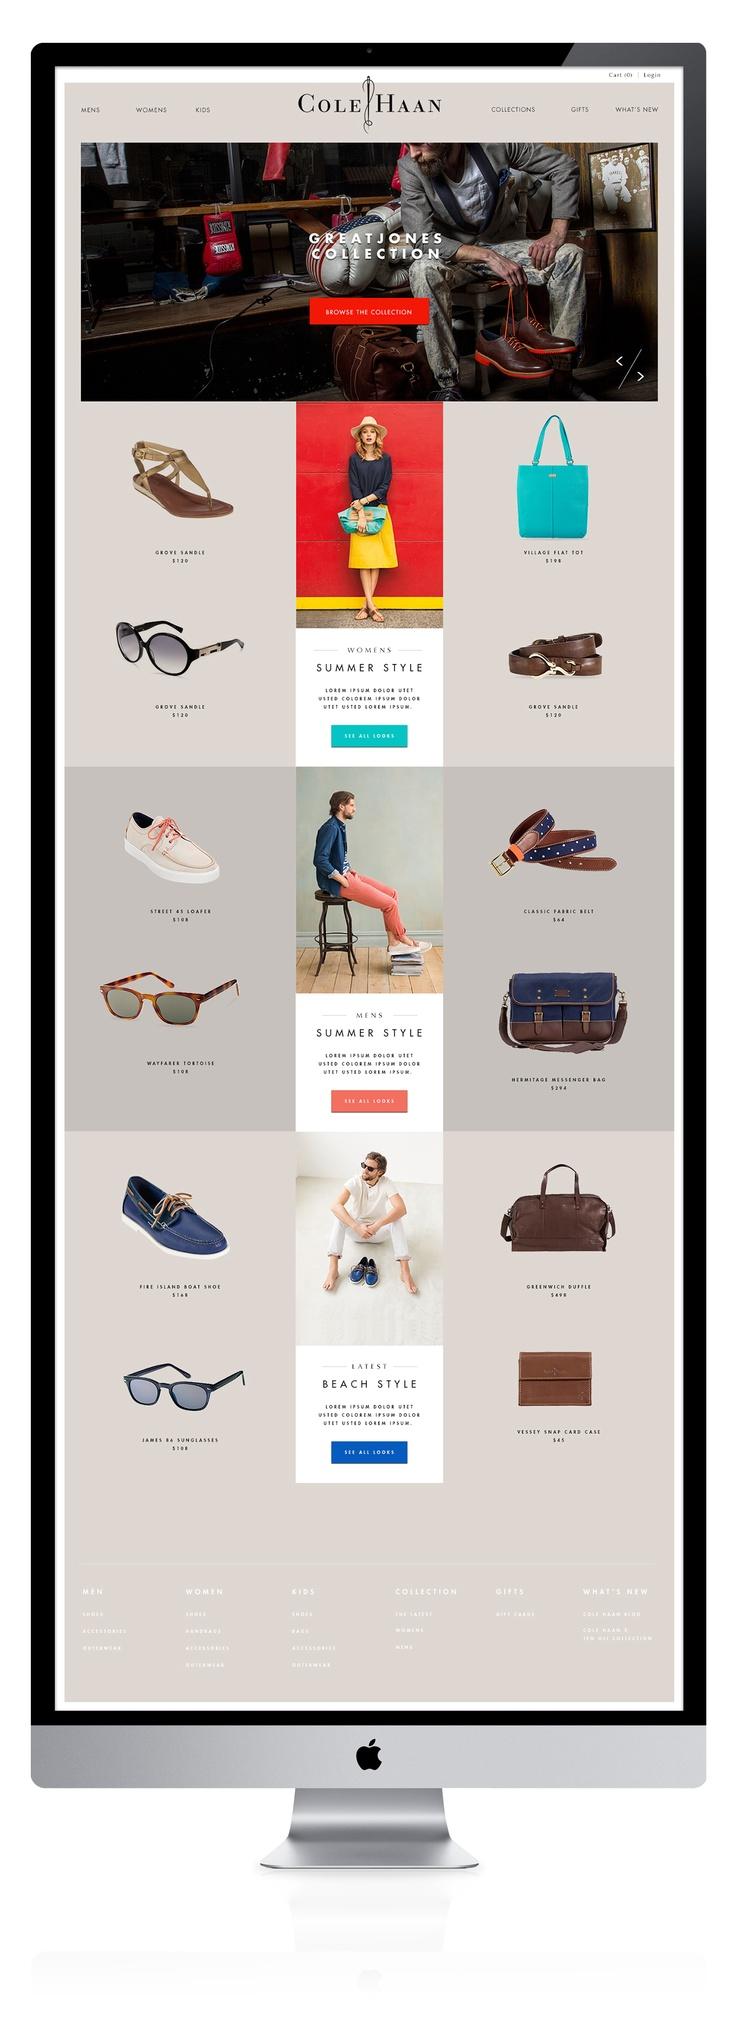 colehaan_home.jpg | #webdesign #it #web #design #layout #userinterface #website #webdesign < repinned by www.BlickeDeeler.de | Take a look at www.WebsiteDesign-Hamburg.de